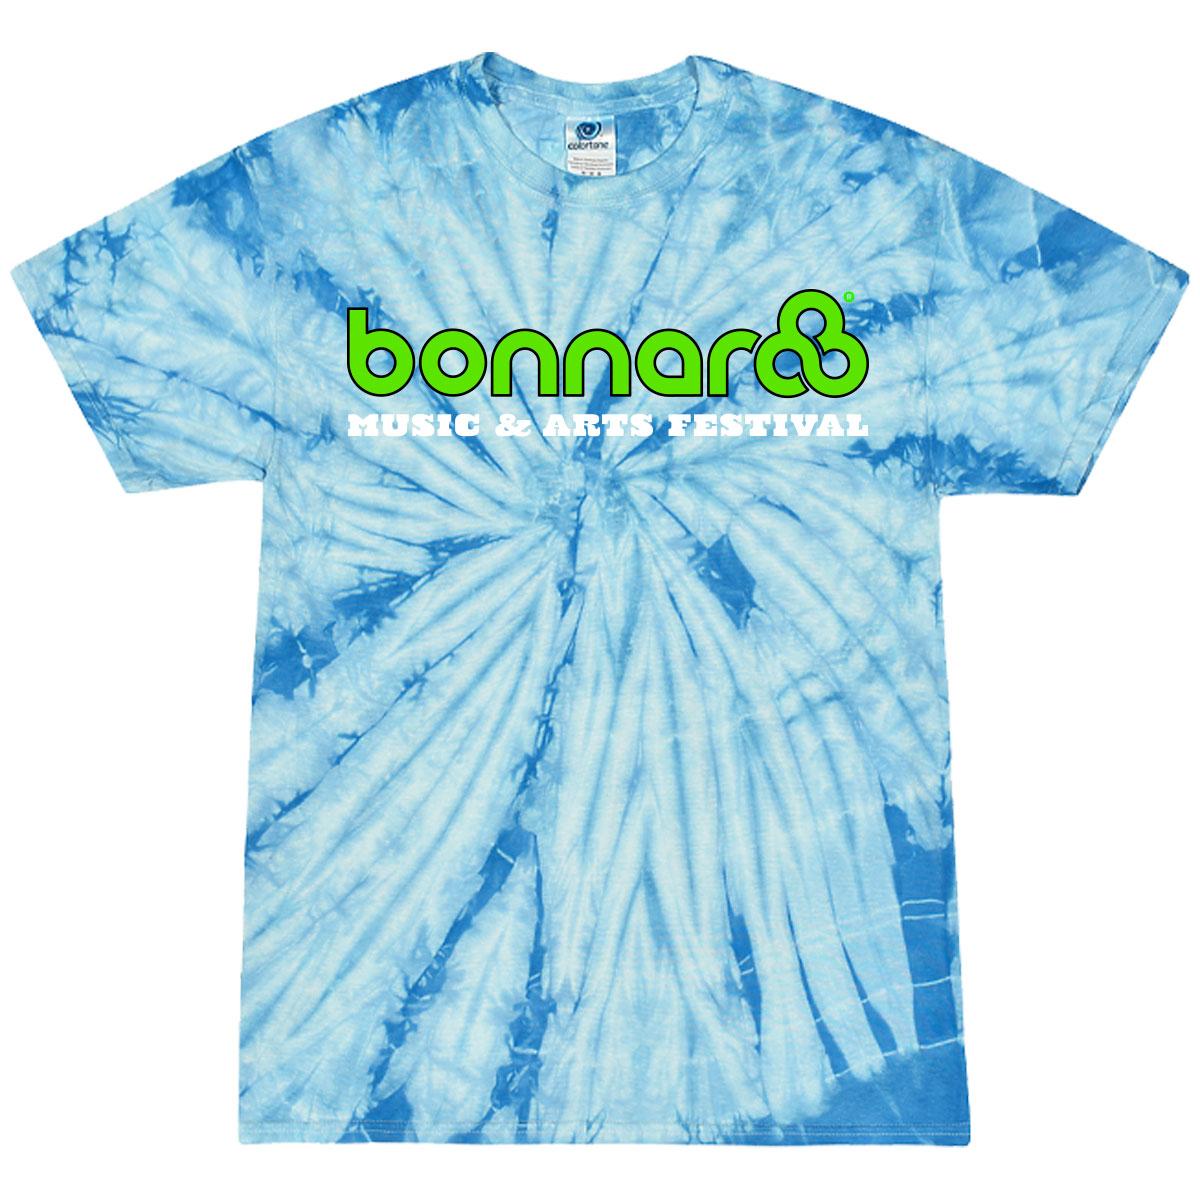 Bonnaroo 2021 Baby Blue Event Tie Dye